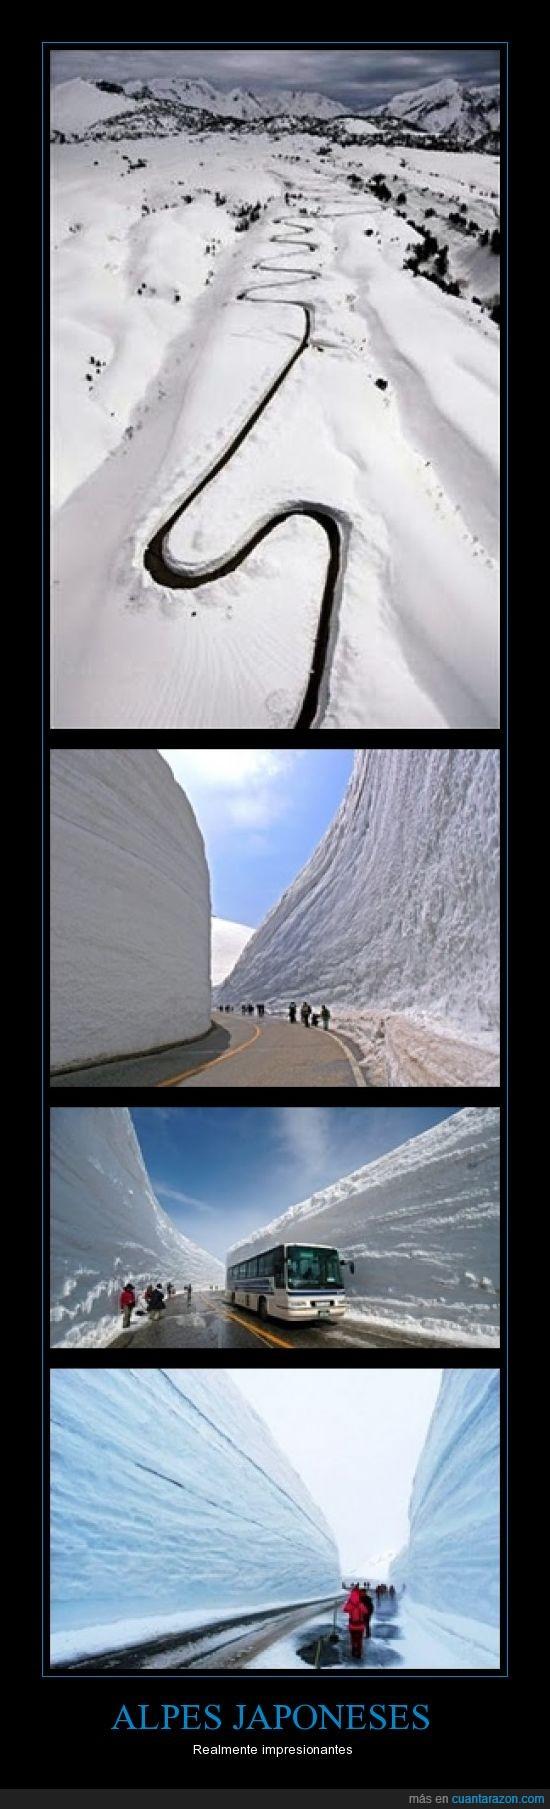 alpes,carretera,japoneses,montaña,nieve